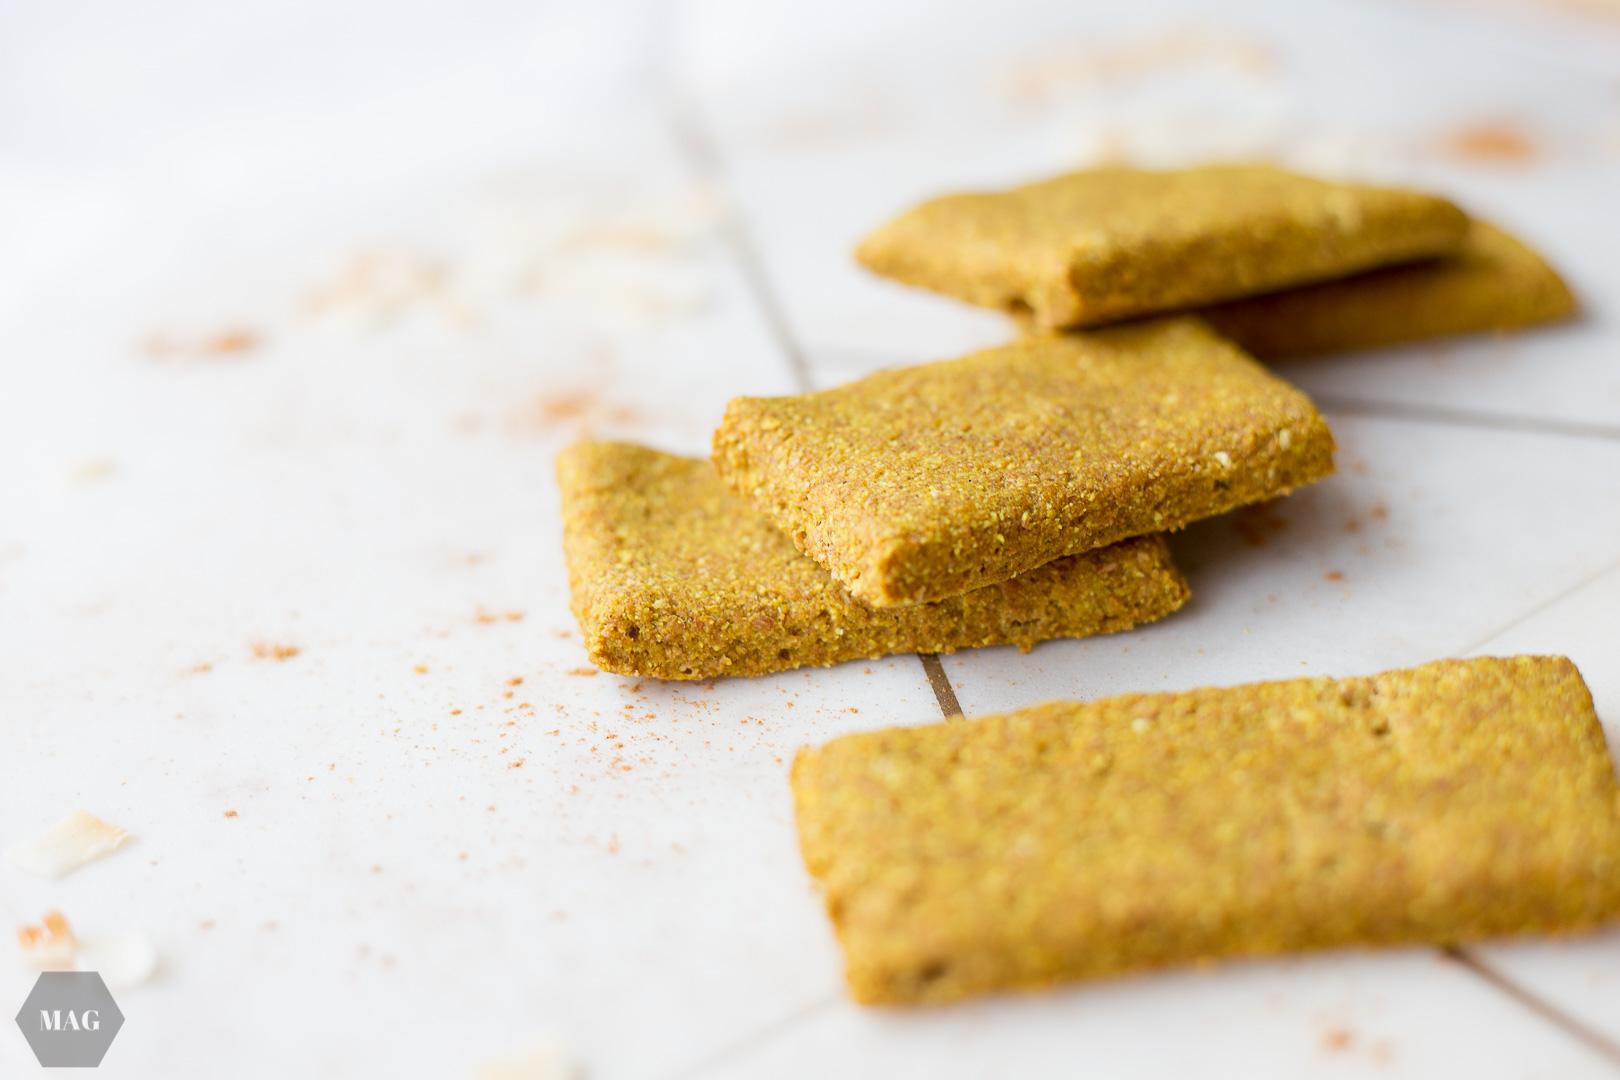 Kurkuma-Kekse nach Art der Goldenen Milch